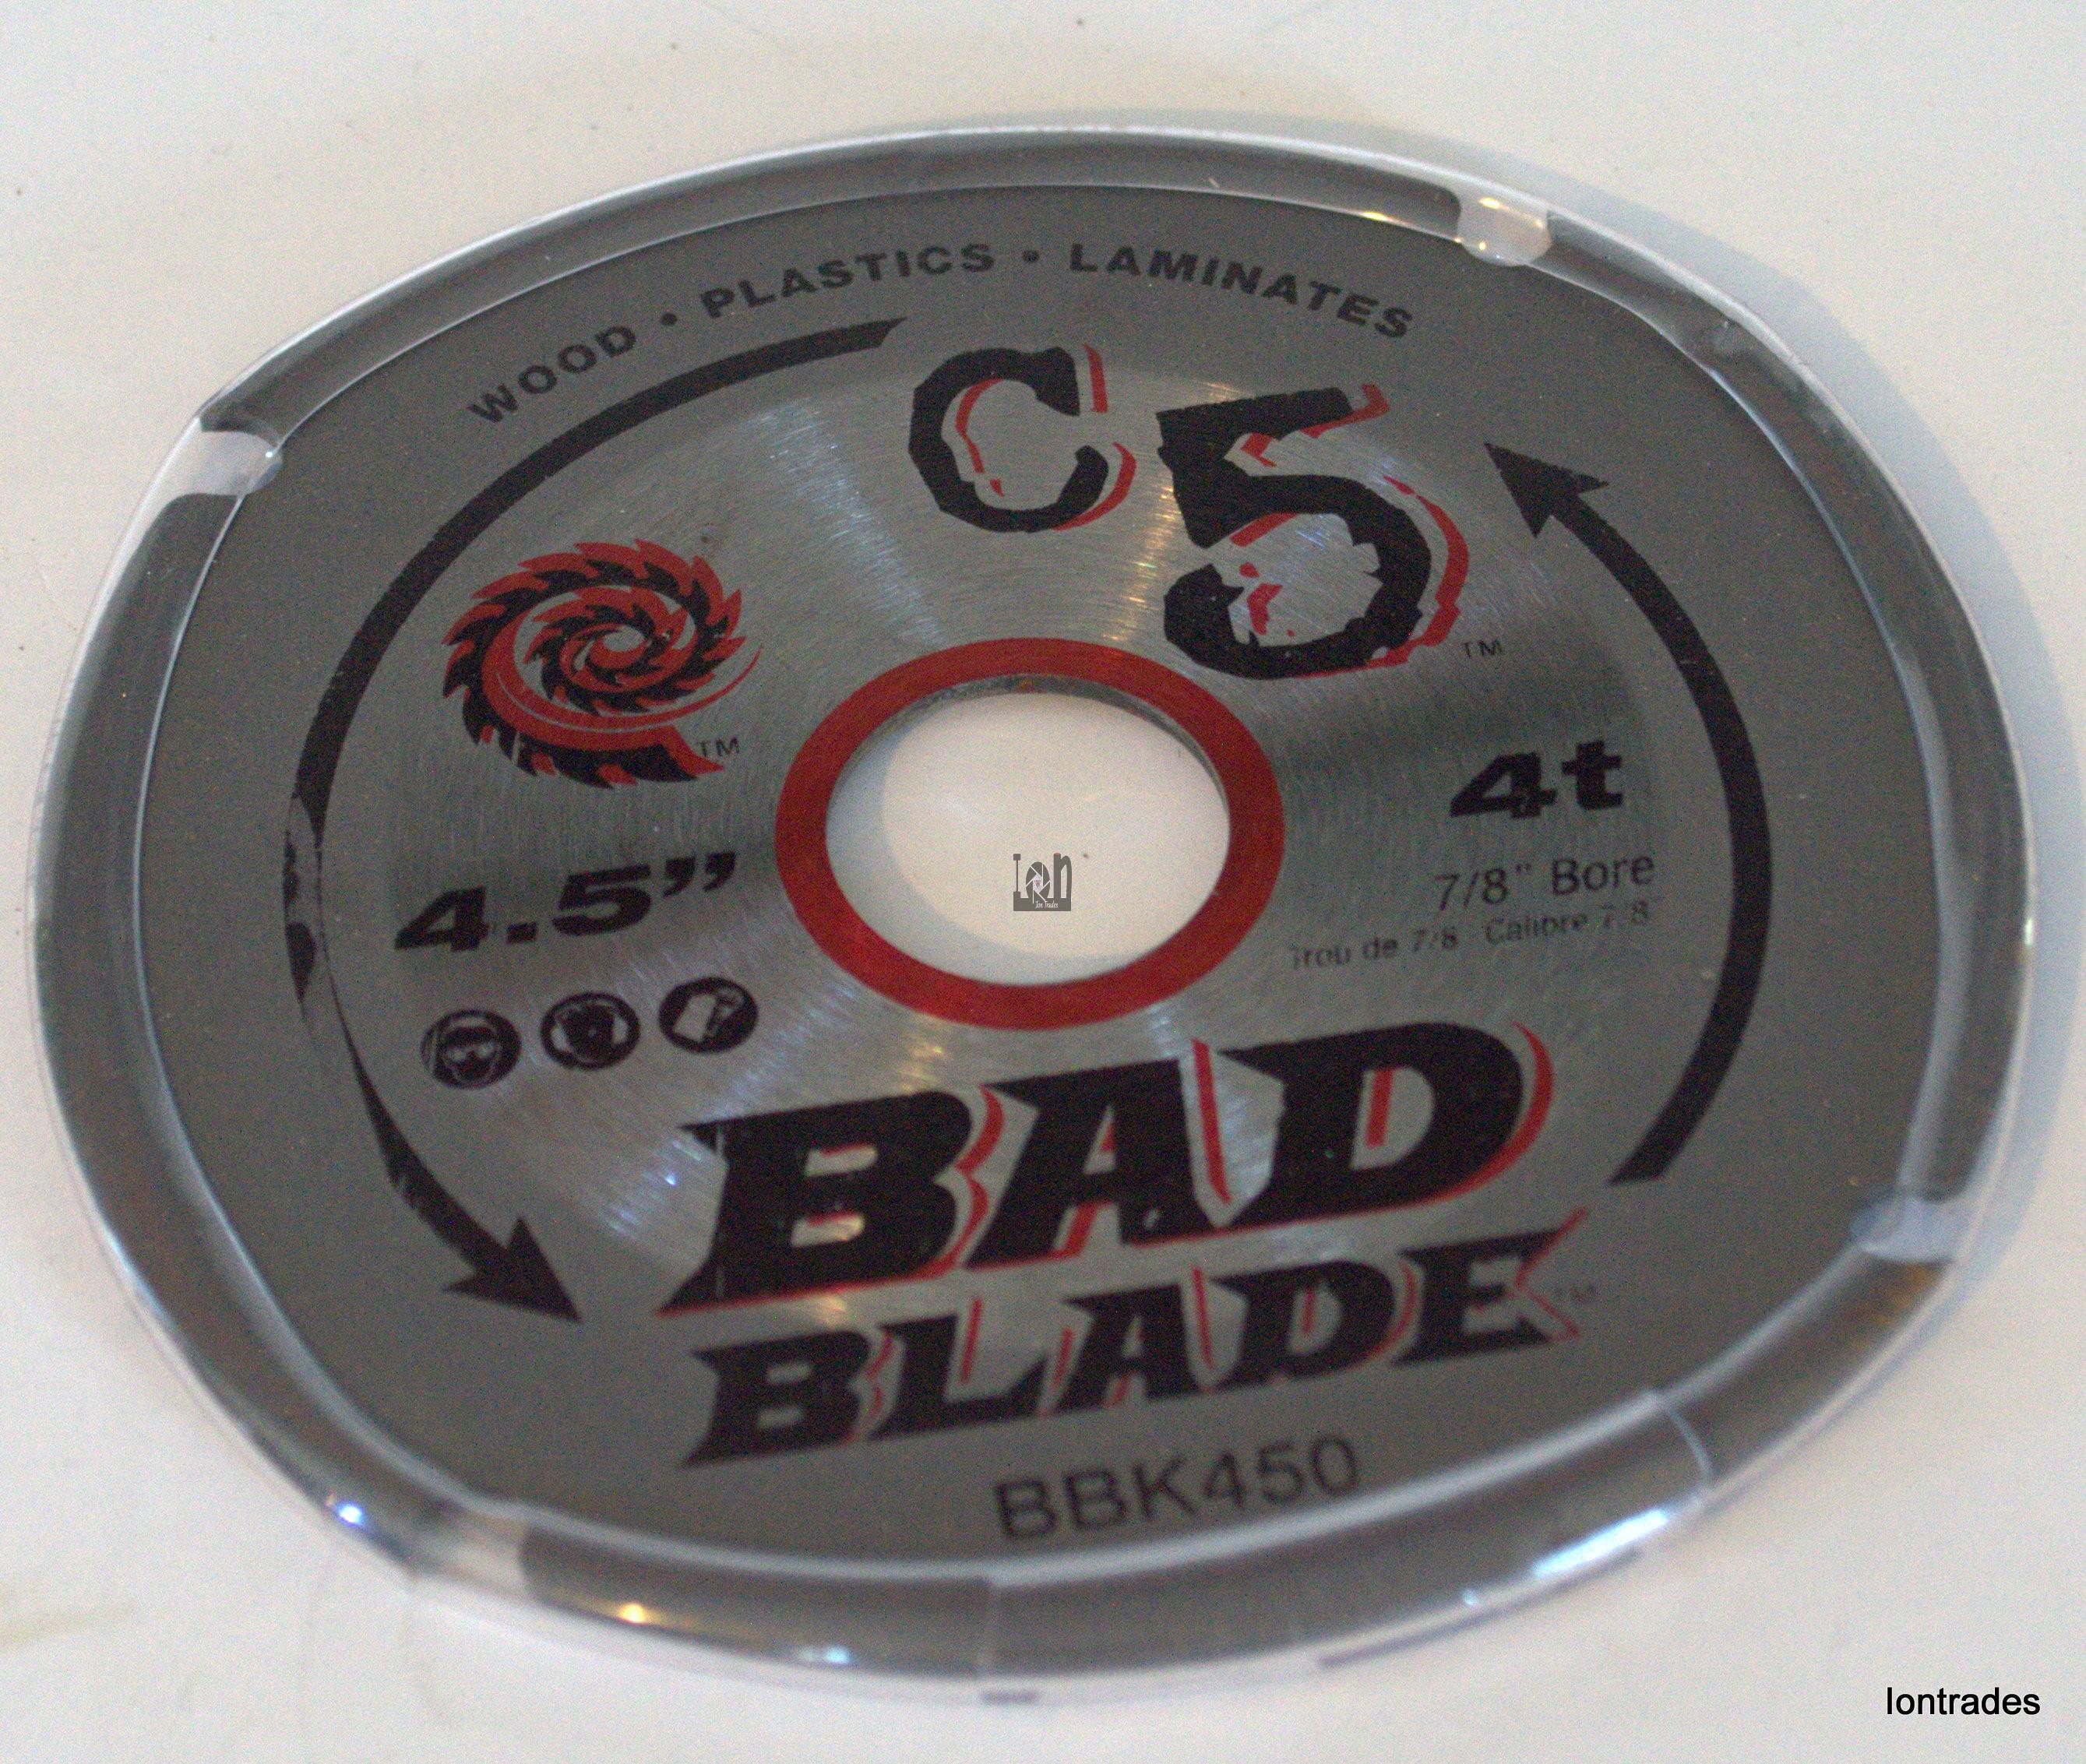 "Kwik Tool 4.5"" Circular Saw Blade BBK450 Bad Blade 7/8"" Arbor C5 4Tooth"